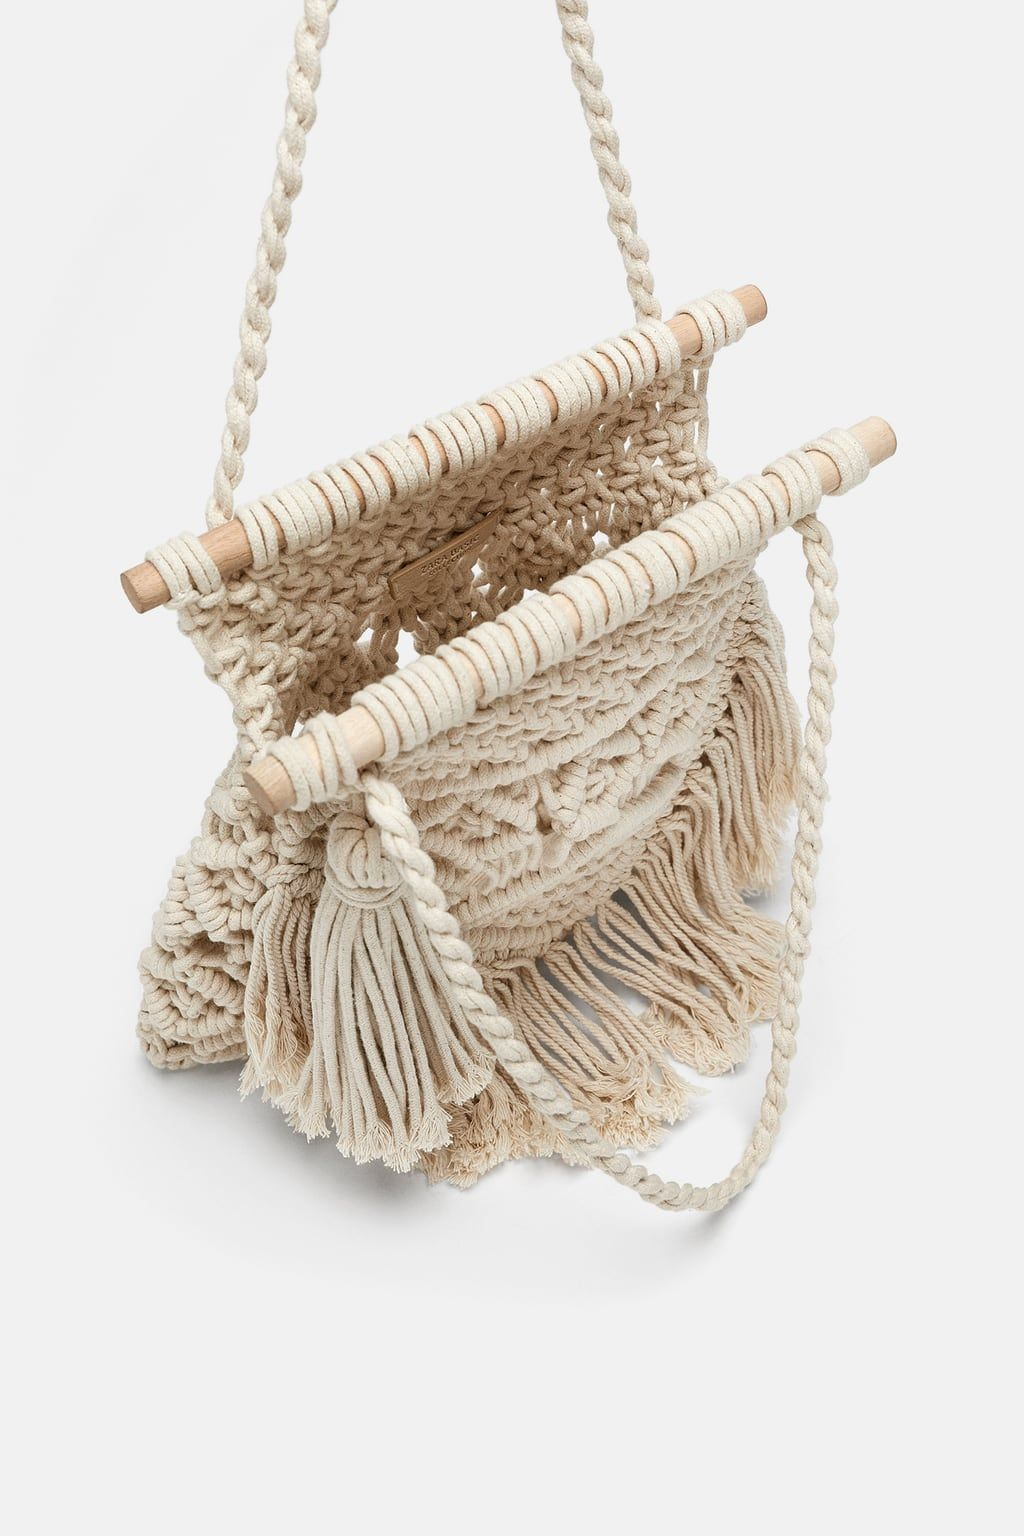 e82783f8a7 Image 4 of FABRIC SHOPPER from Zara Crochet Bracelet